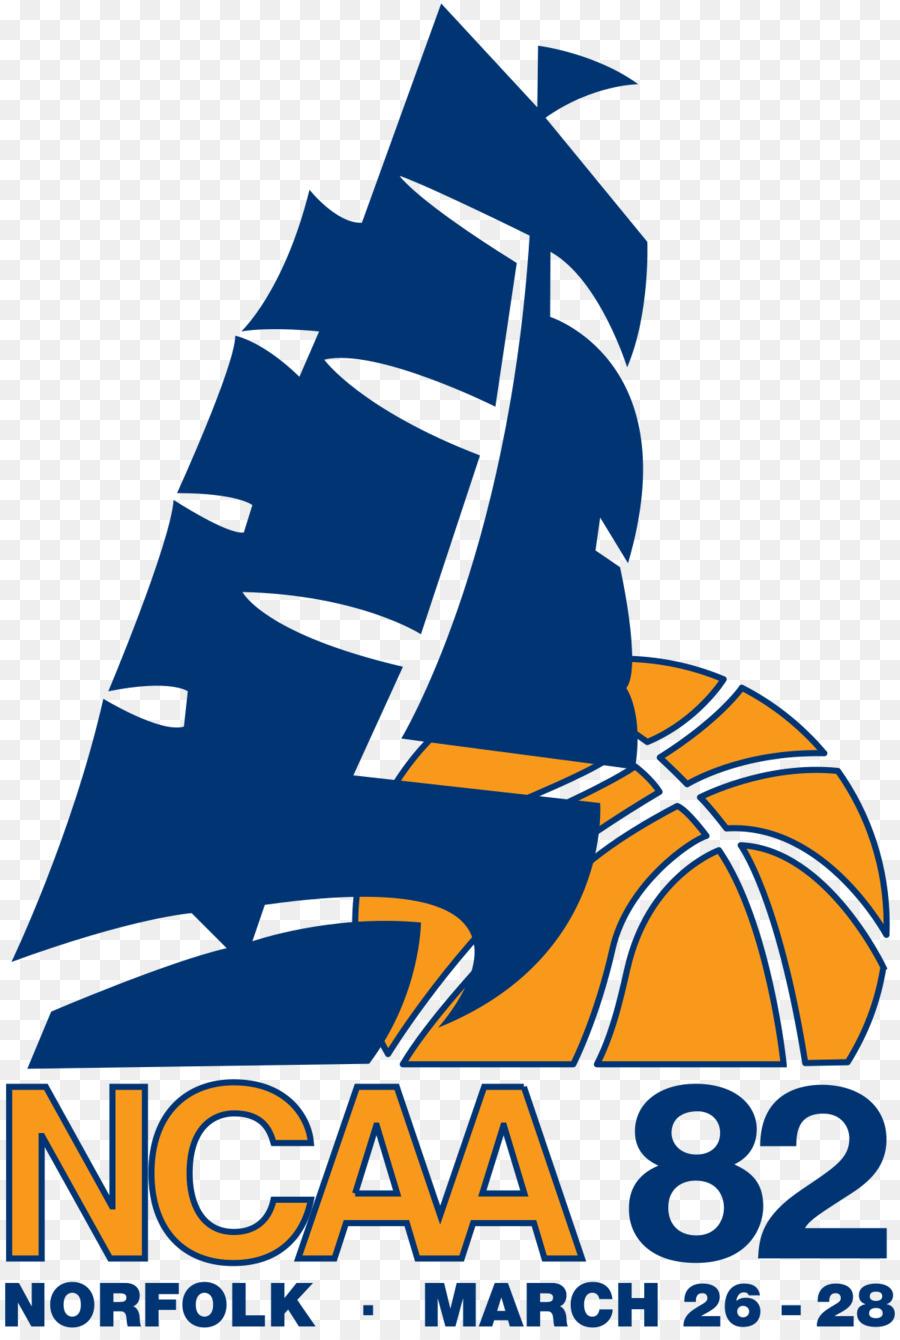 1982 NCAA Division I Men's Basketball Tournament 1983 NCAA Division.